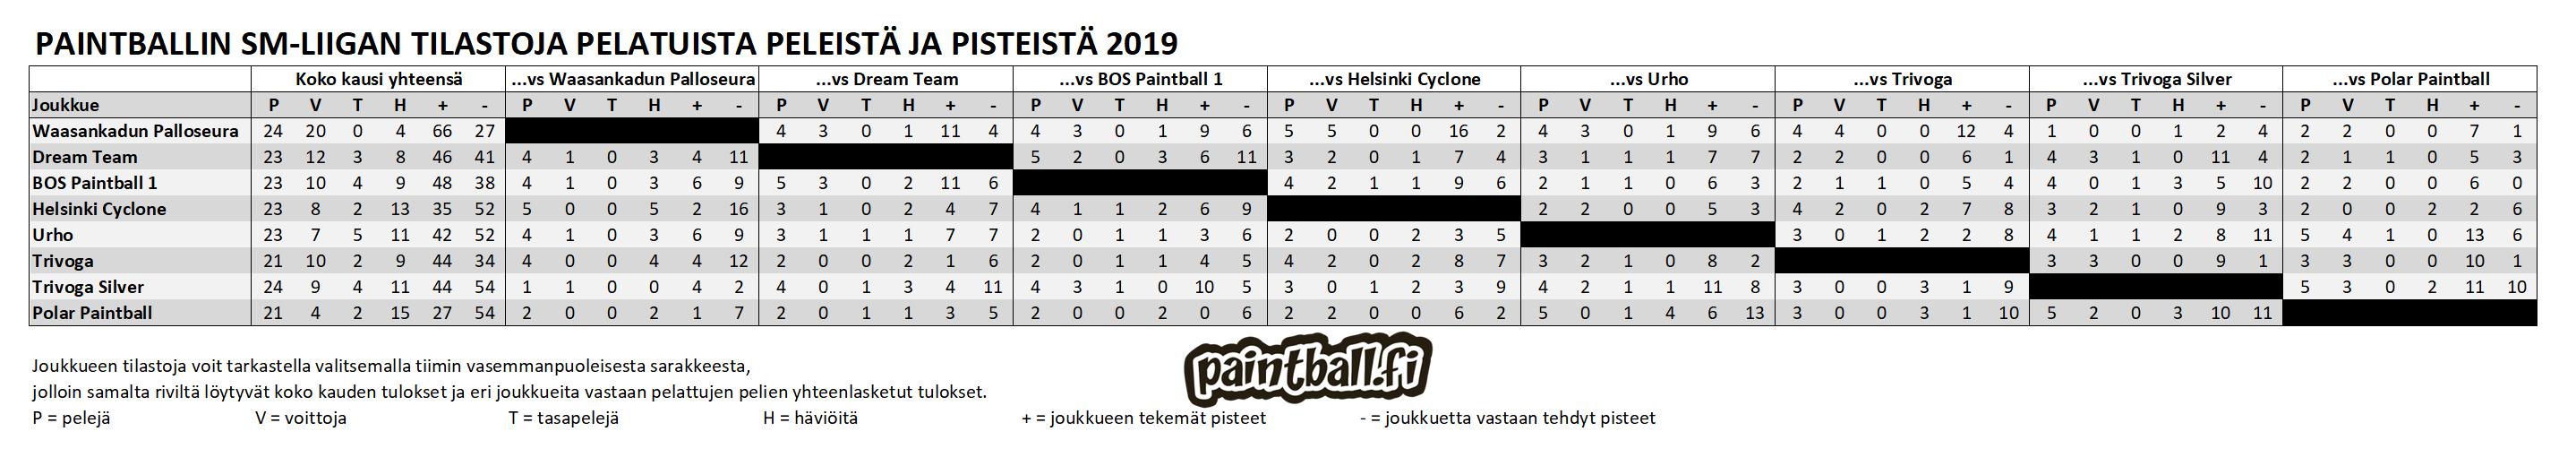 2019_smliiga_tilastot.PNG